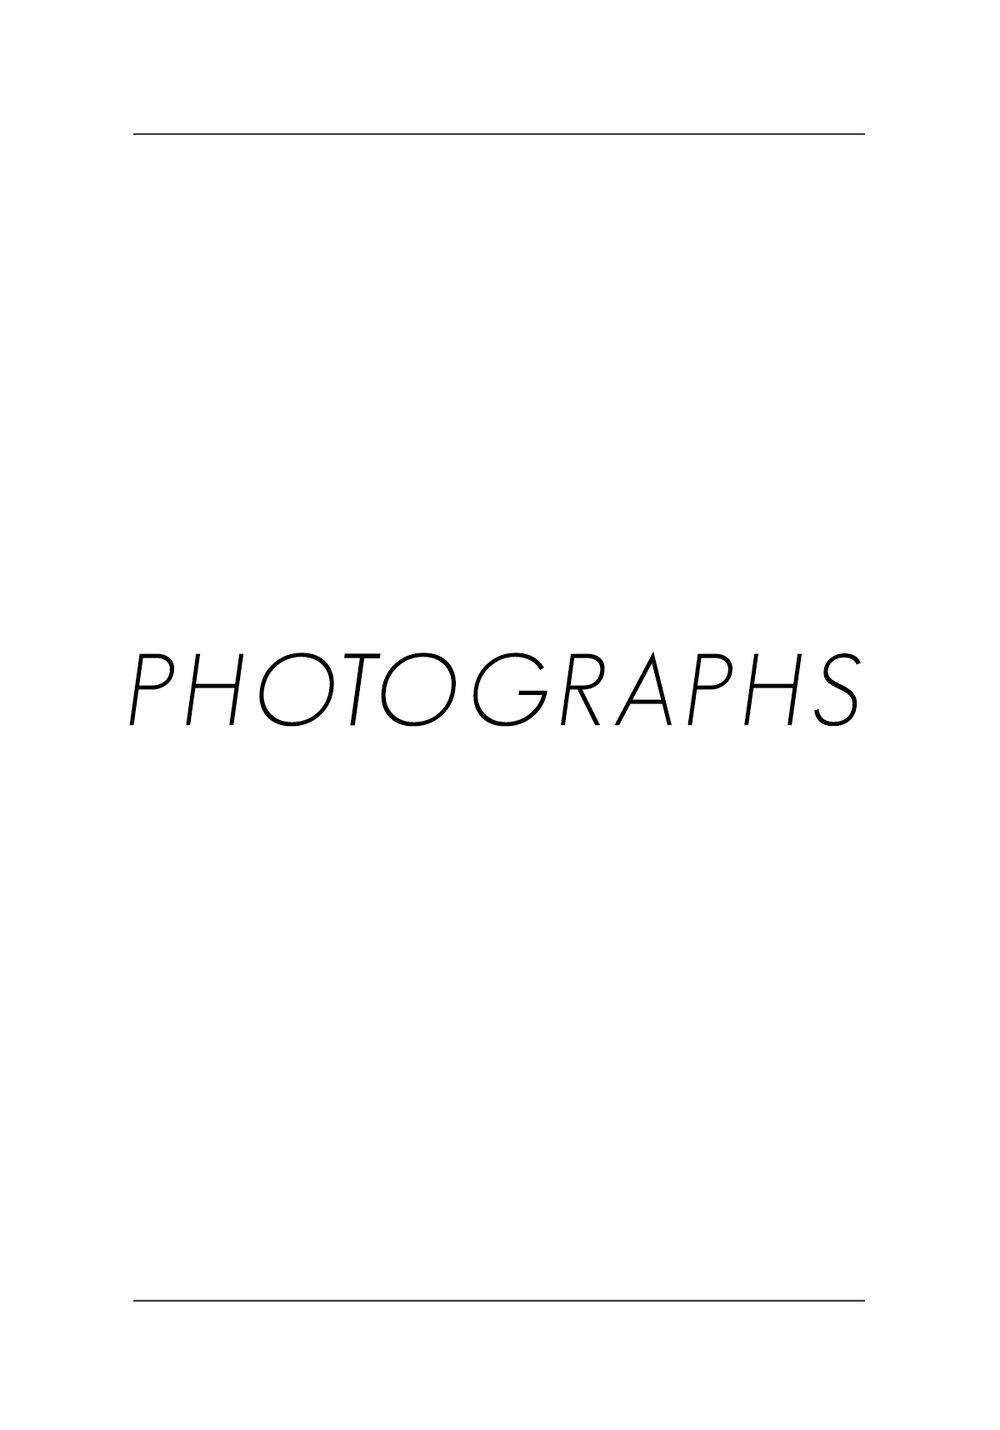 JackieDpalmerphotos.jpg